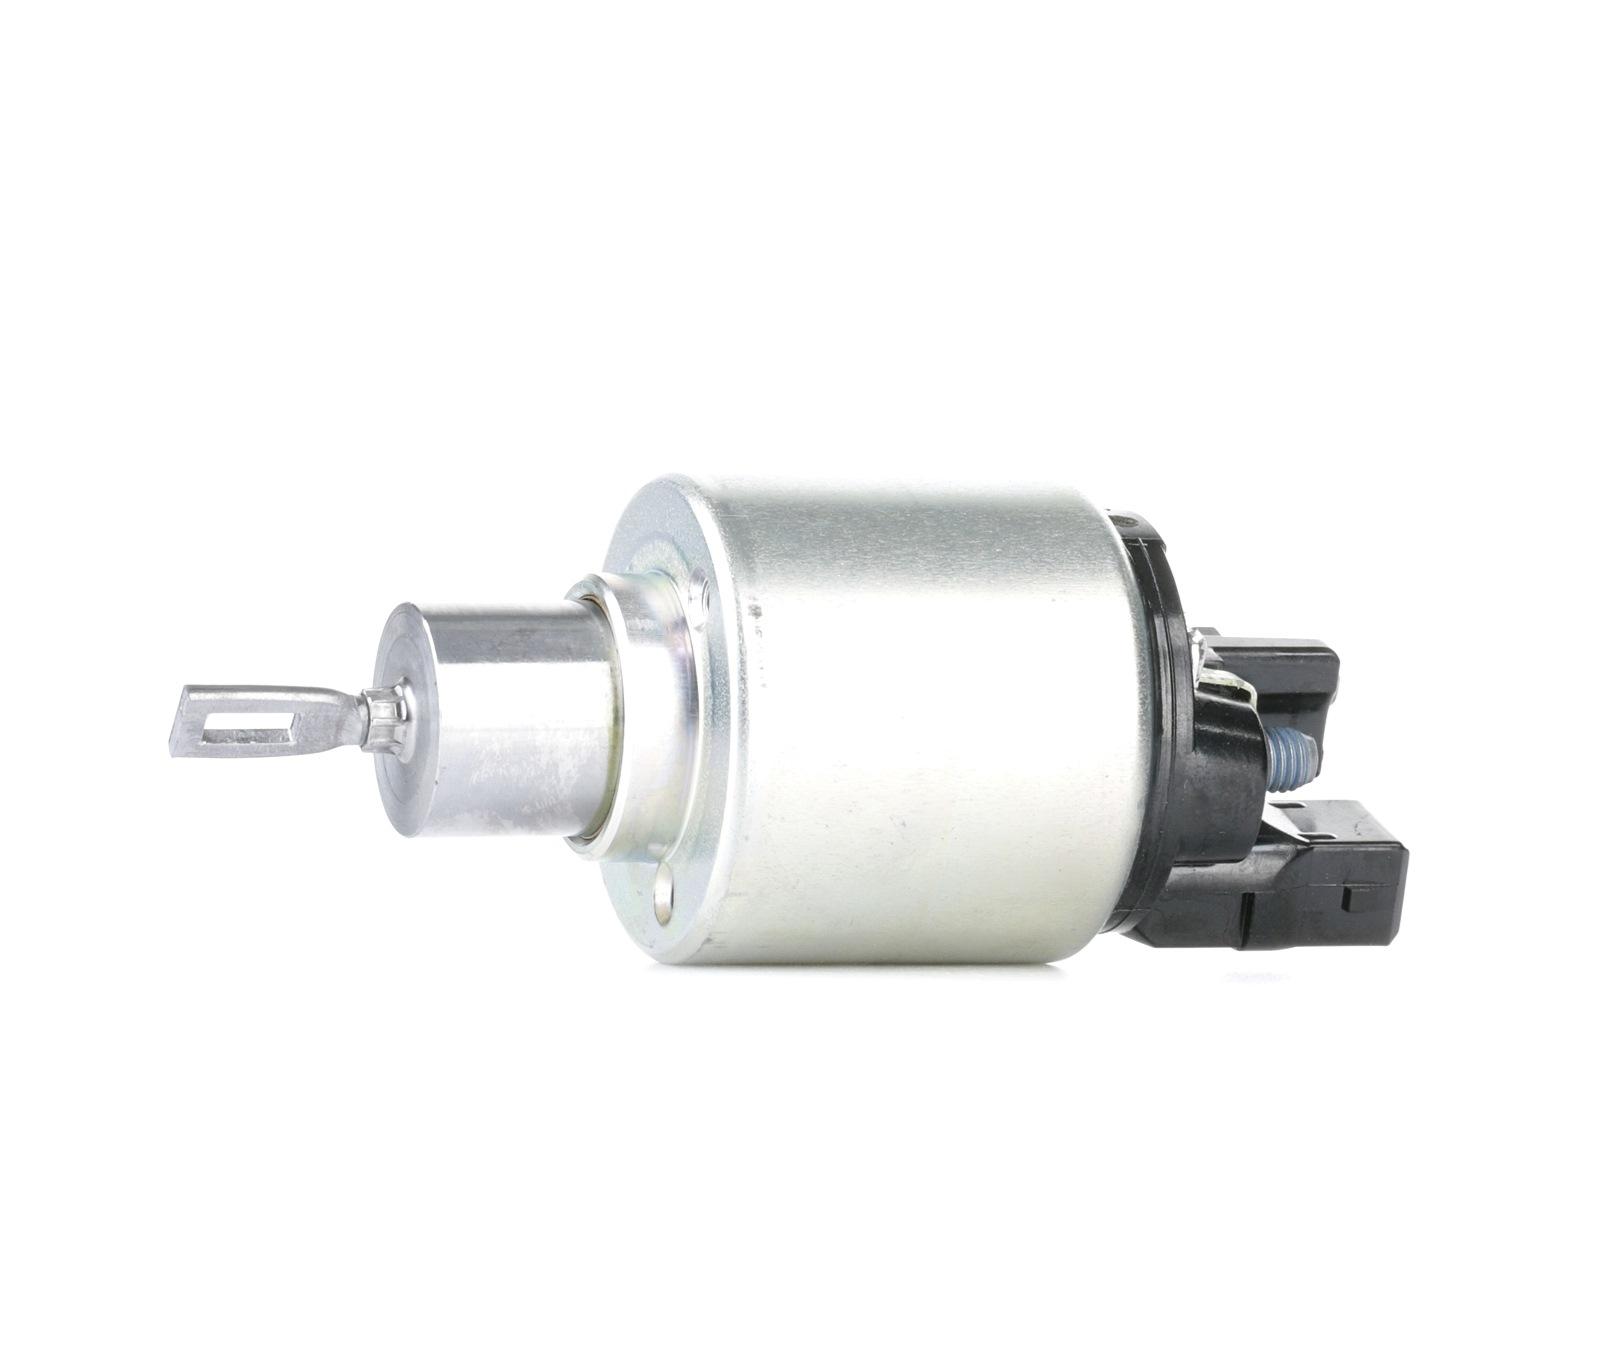 Buy Starter solenoid switch BOSCH 2 339 303 412